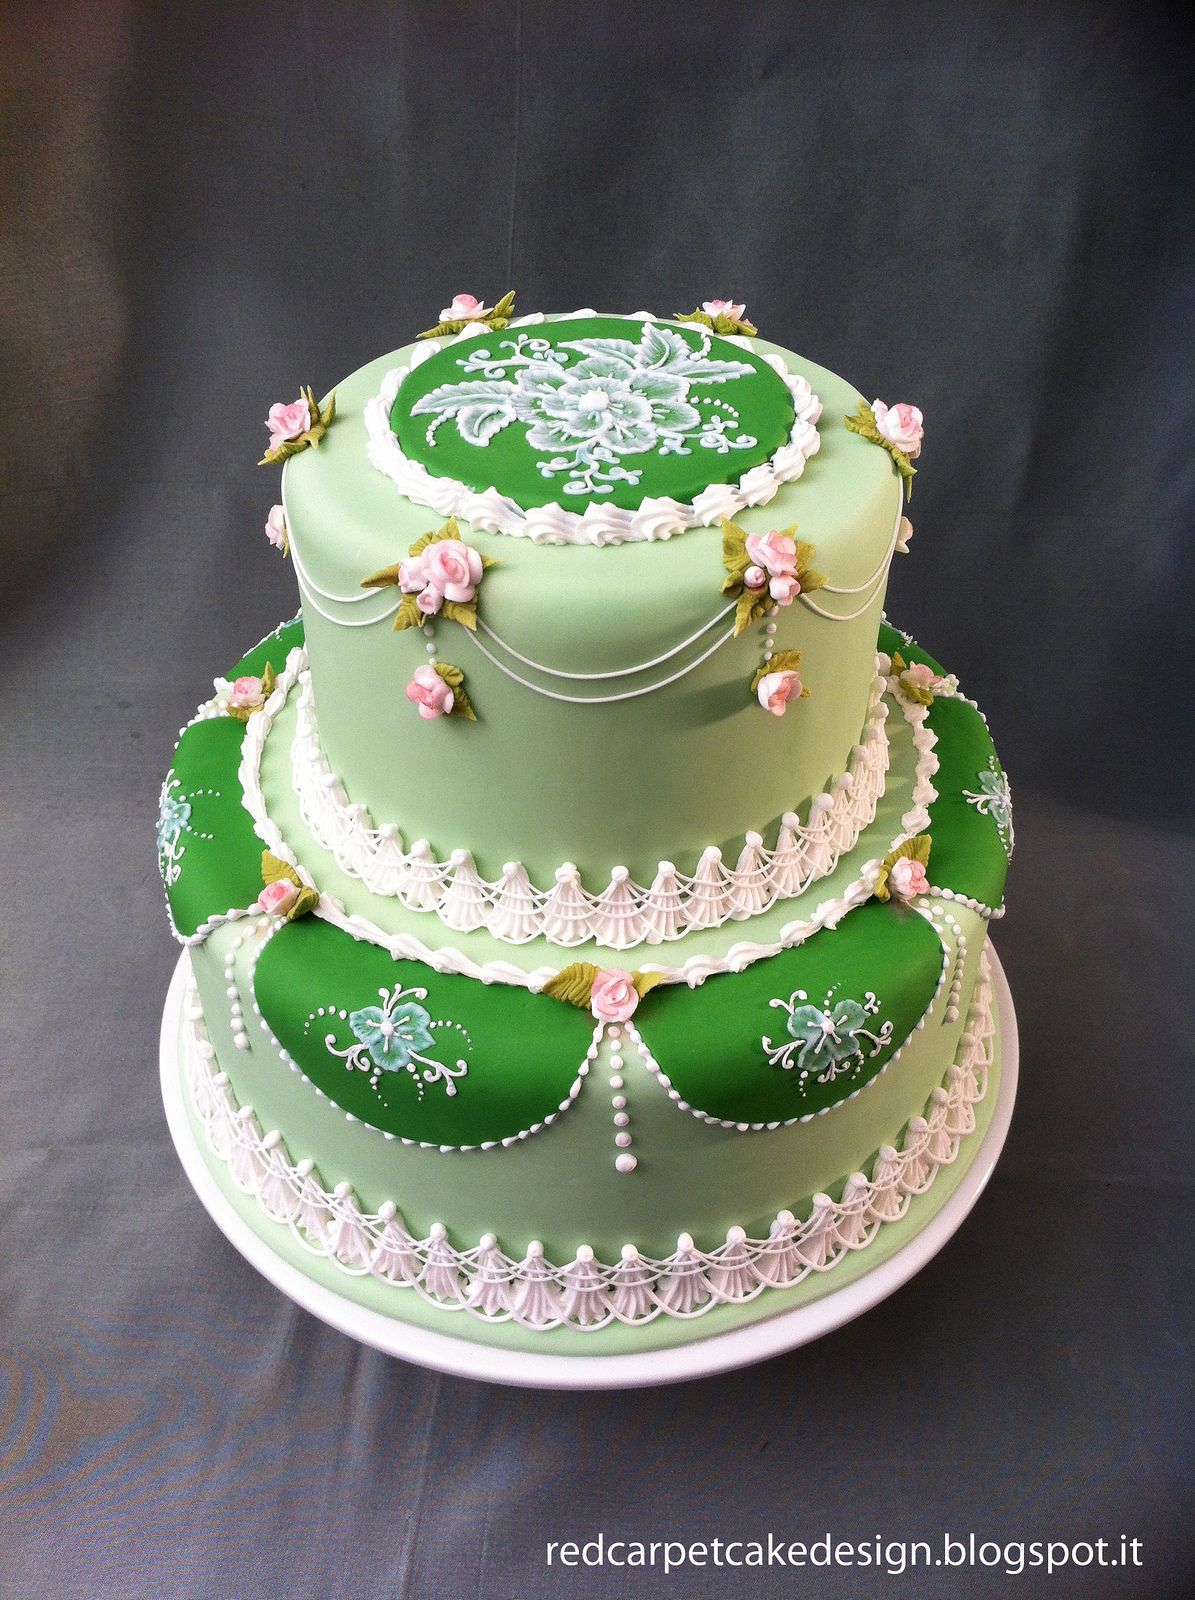 equipe eccellenze italiane cake designer fip - red carpet cake, Mobel ideea